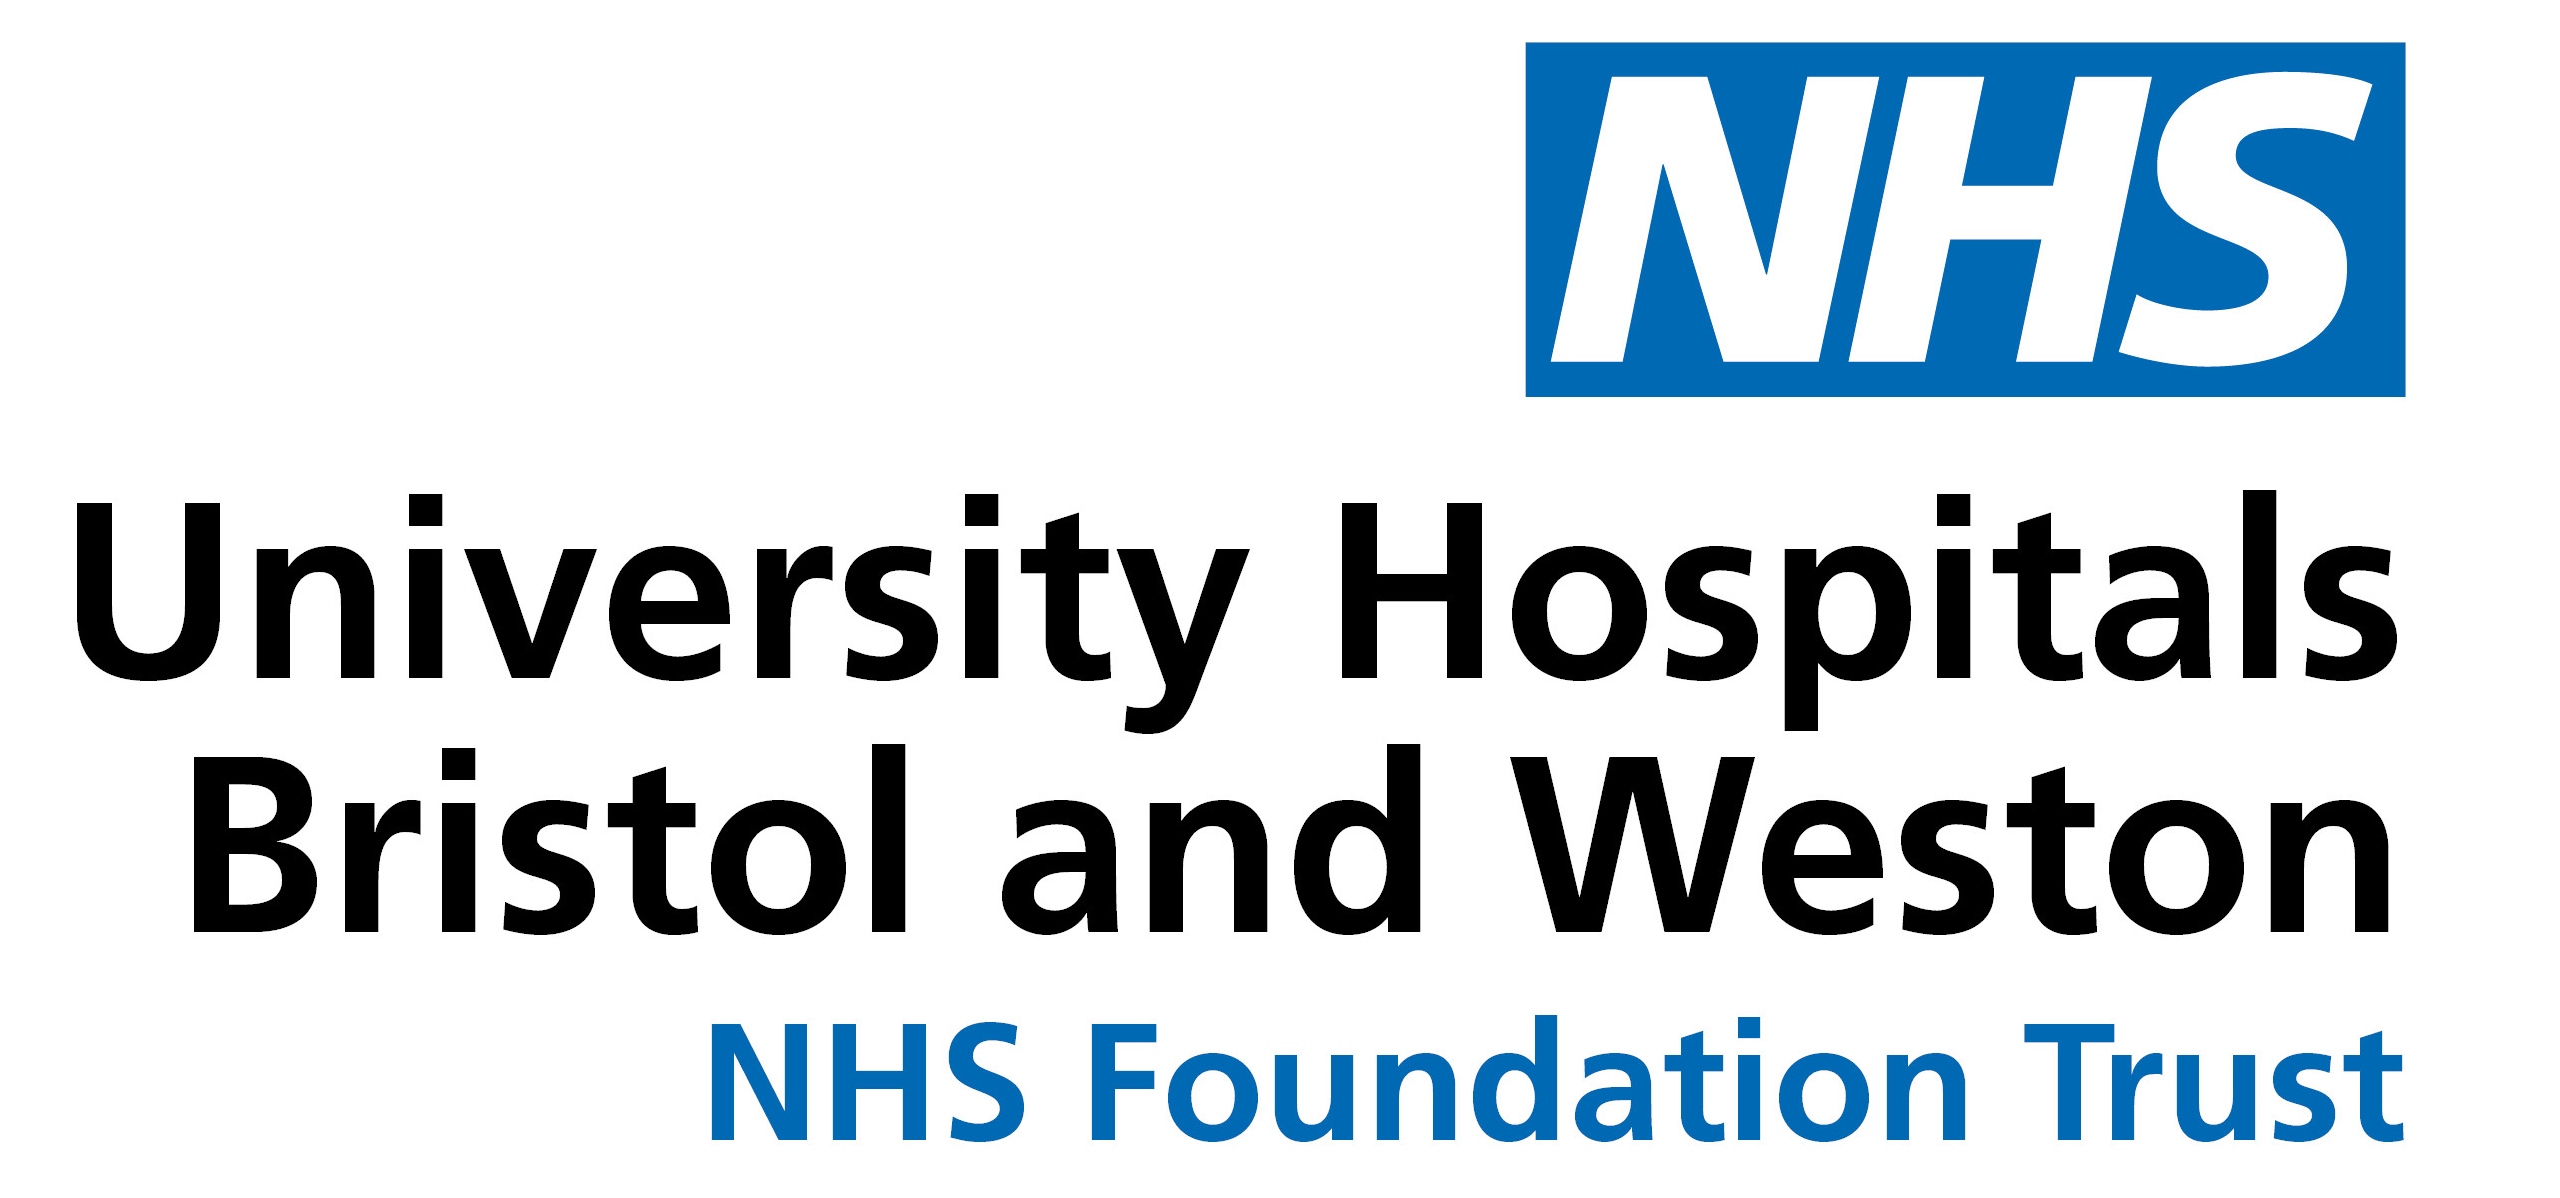 University Hospitals Bristol and Weston NHS Foundation Trust logo